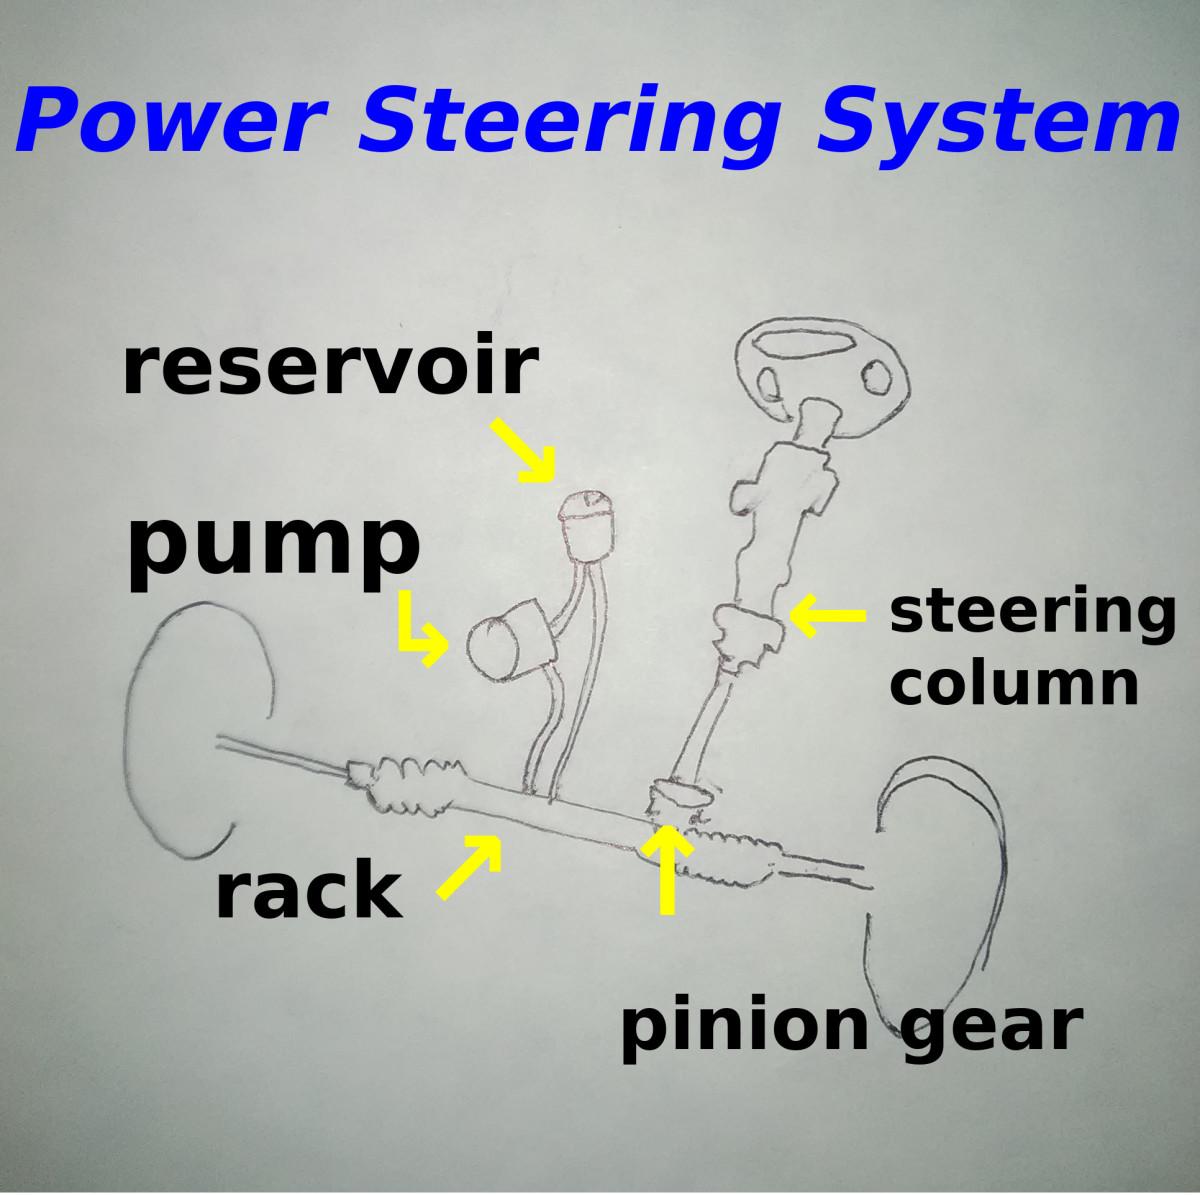 Tips for Finding and Repairing Power Steering Leaks